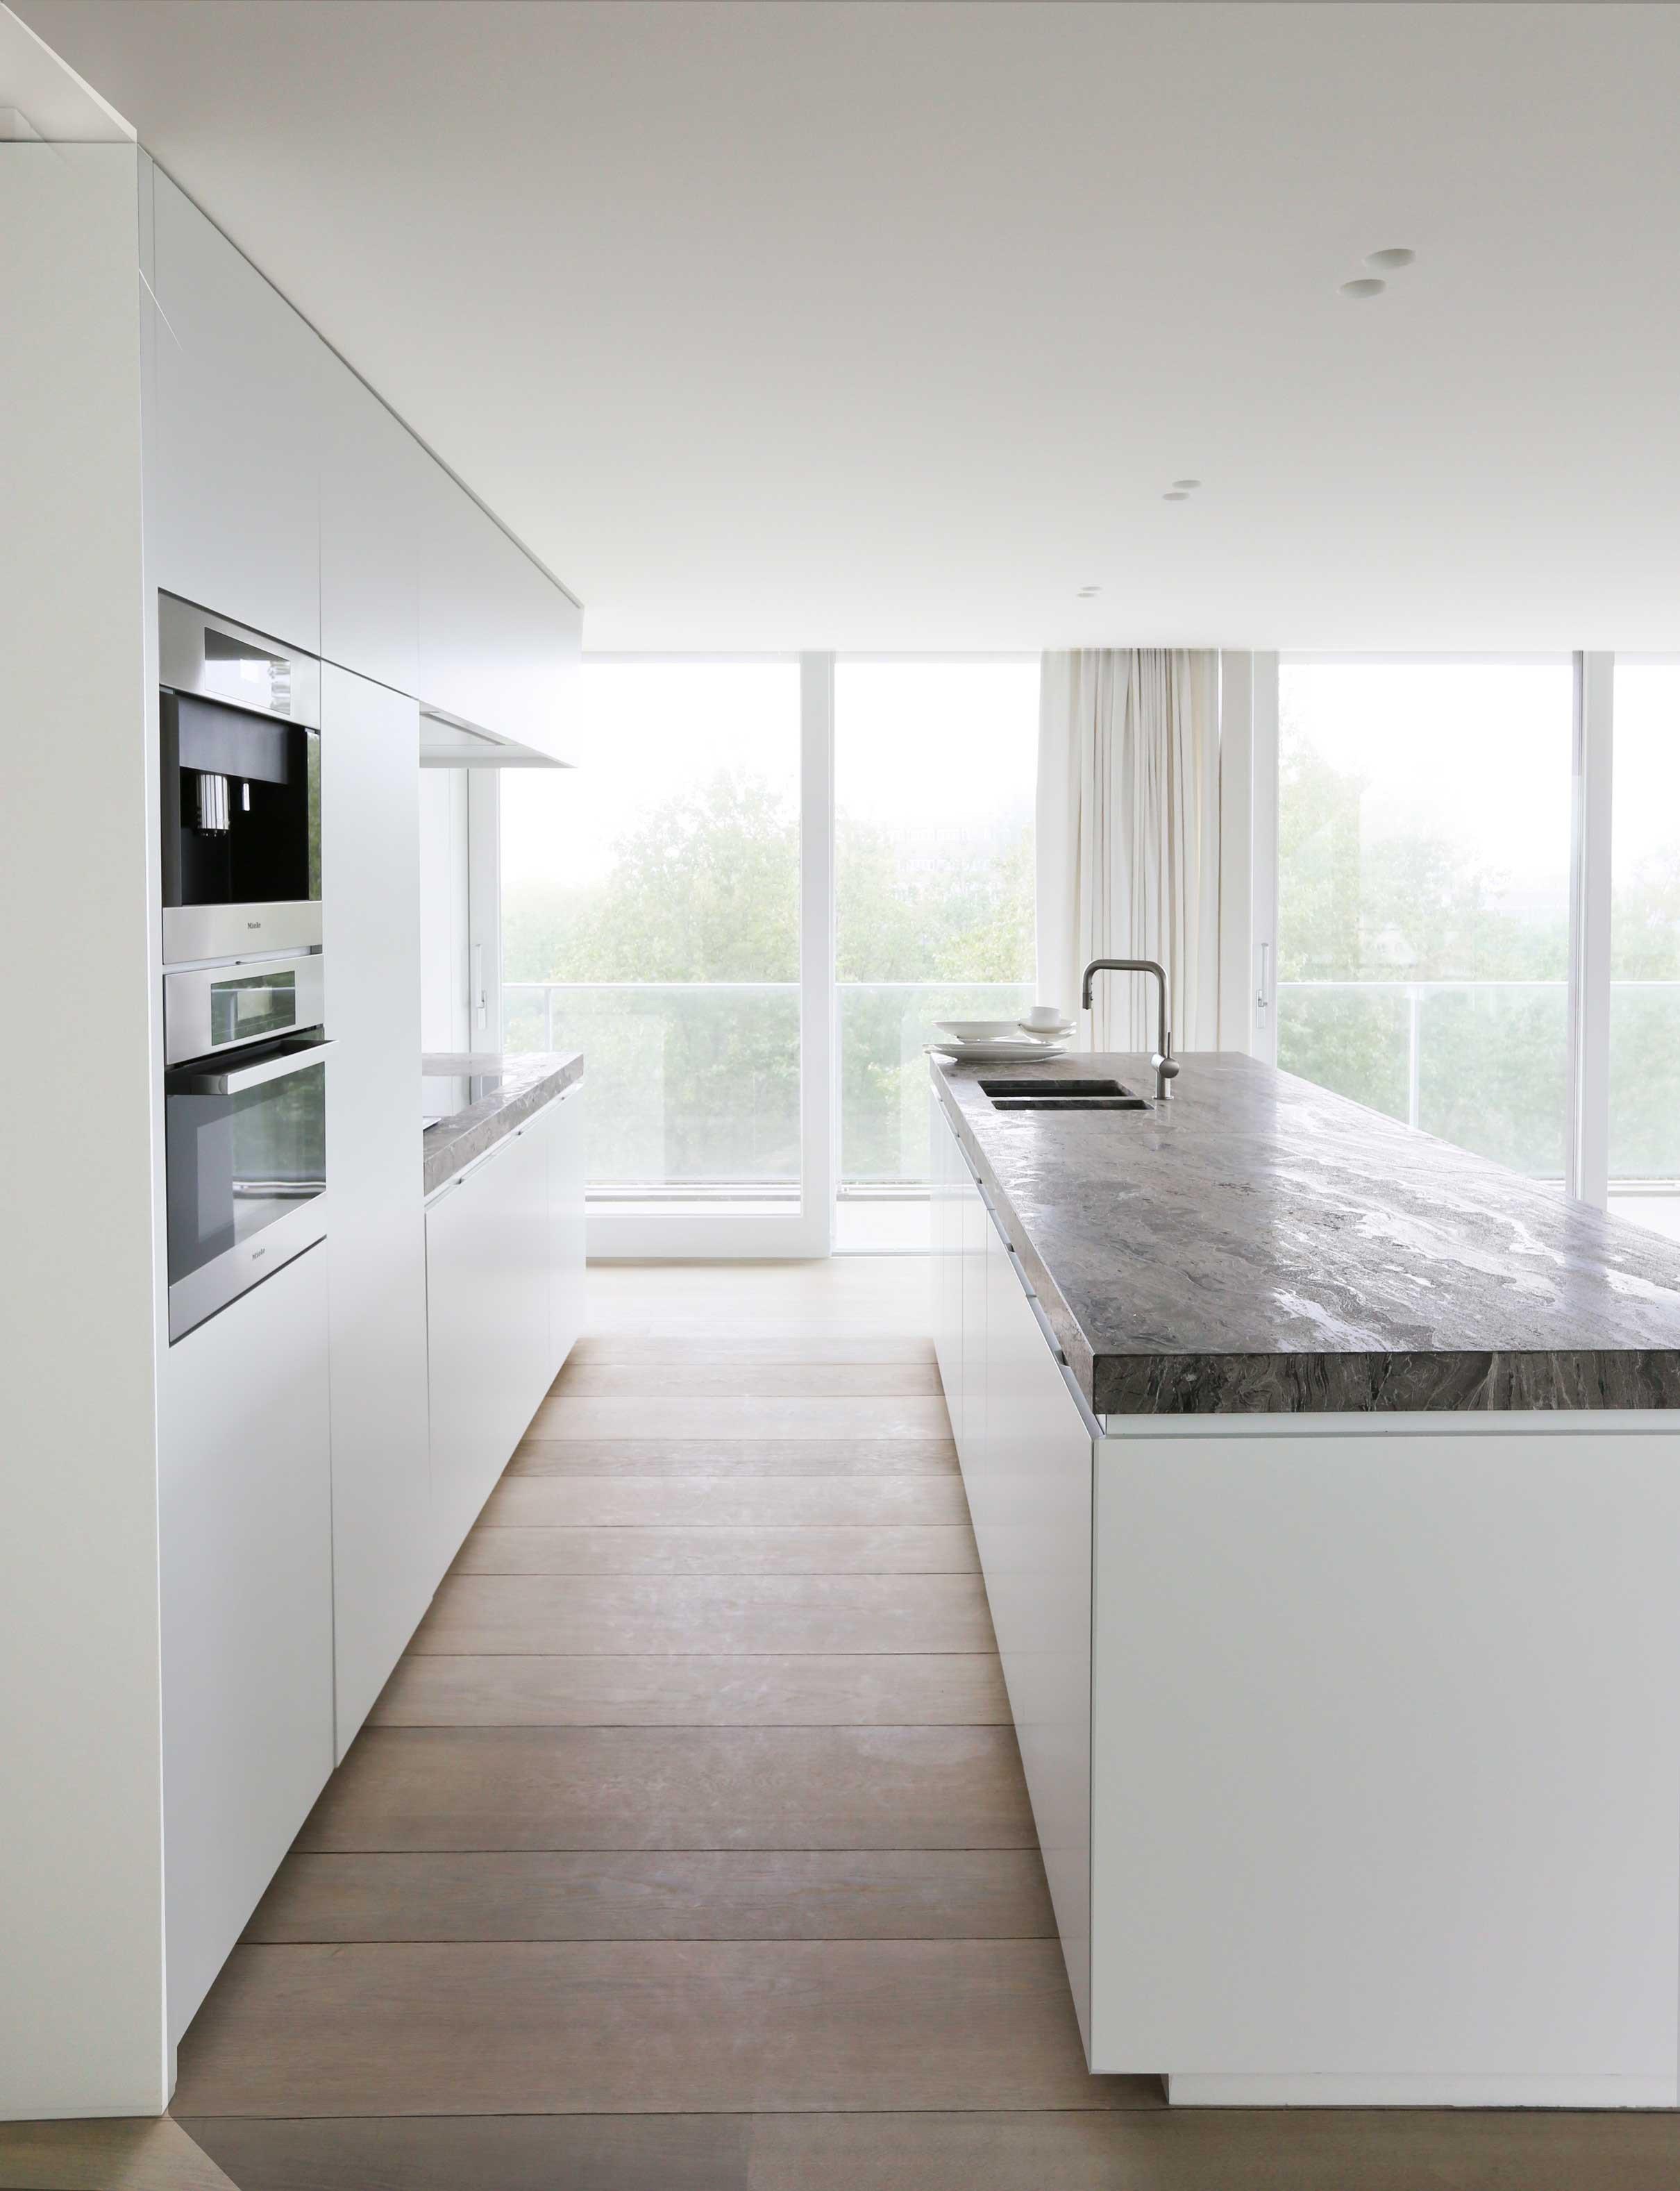 Rietveldprojects.be-ArneJ-duinen-design-architectuur-kust2.jpg